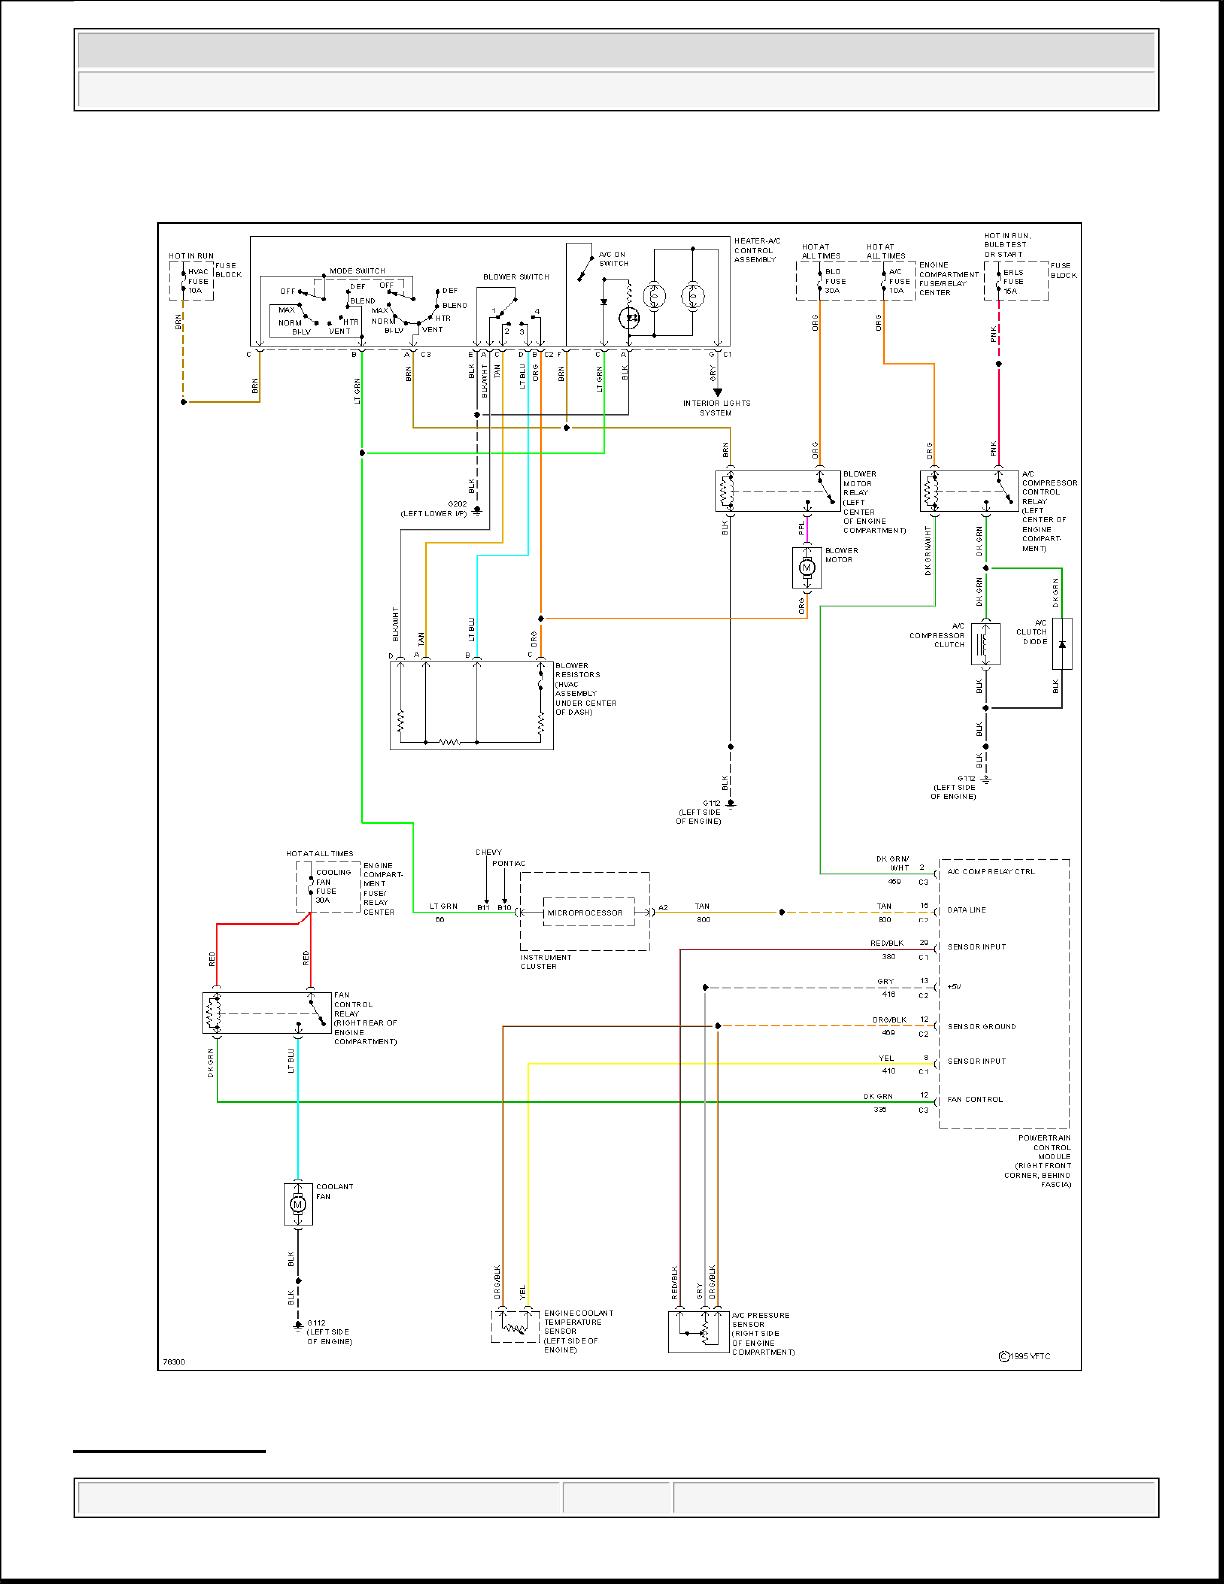 HX_2912] Wiring Diagram 96 Pontiac SunfireShopa Socad Kargi Bdel Diog Usnes Awni Hyedi Unre Jidig Hyedi Nekout Hyedi  Mohammedshrine Librar Wiring 101